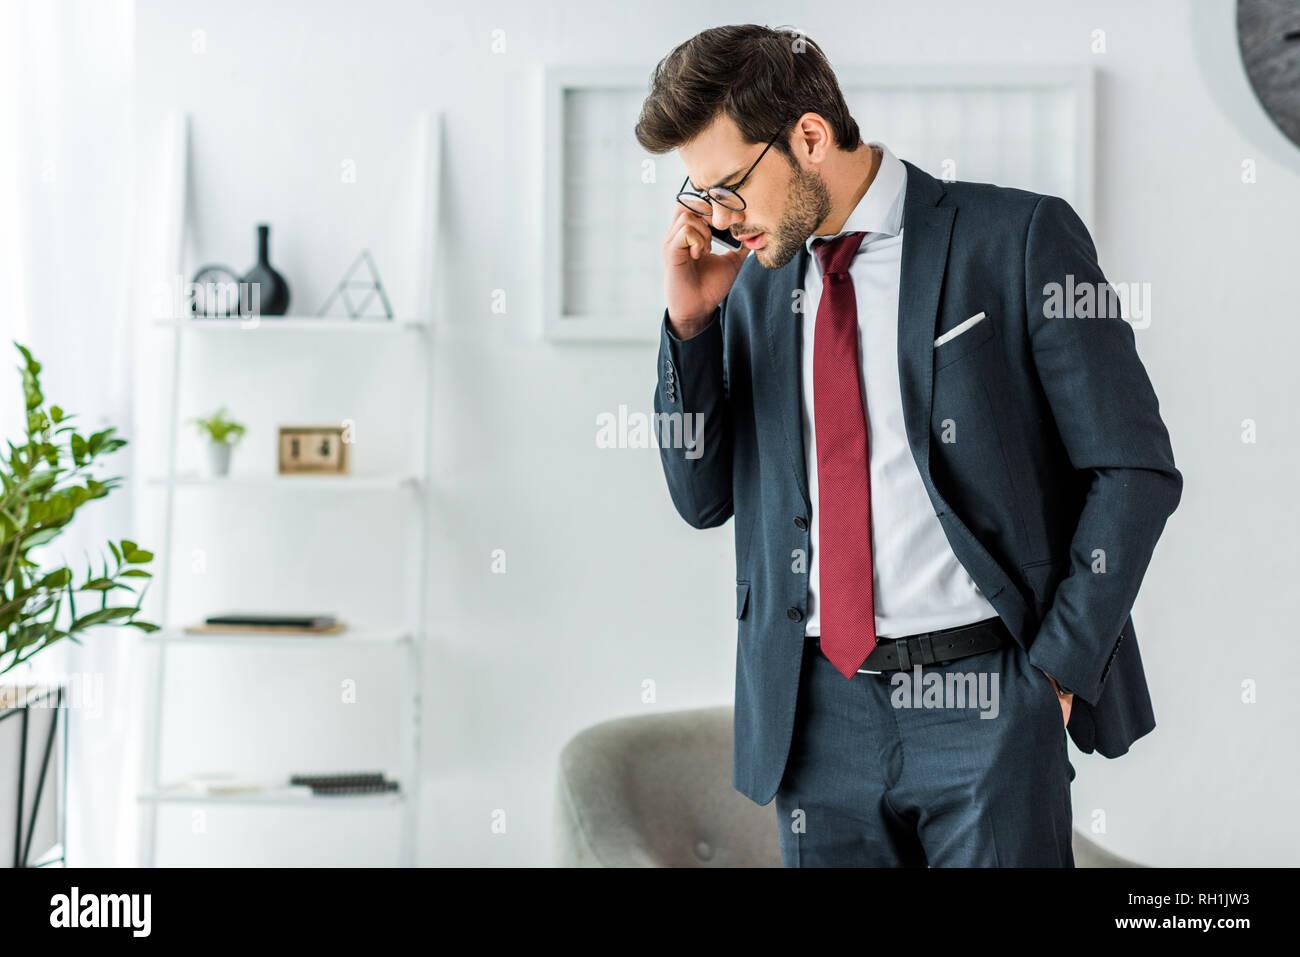 handsome businessman in formal wear talking on smartphone in office - Stock Image